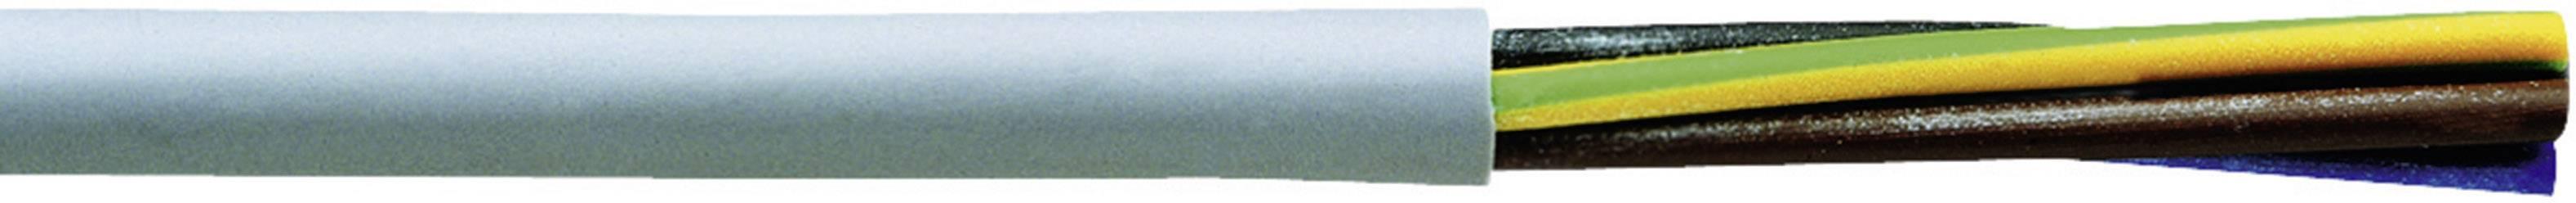 Řídicí kabel Faber Kabel Y-JB (030865), 5 mm, 500 V, šedá, 1 m